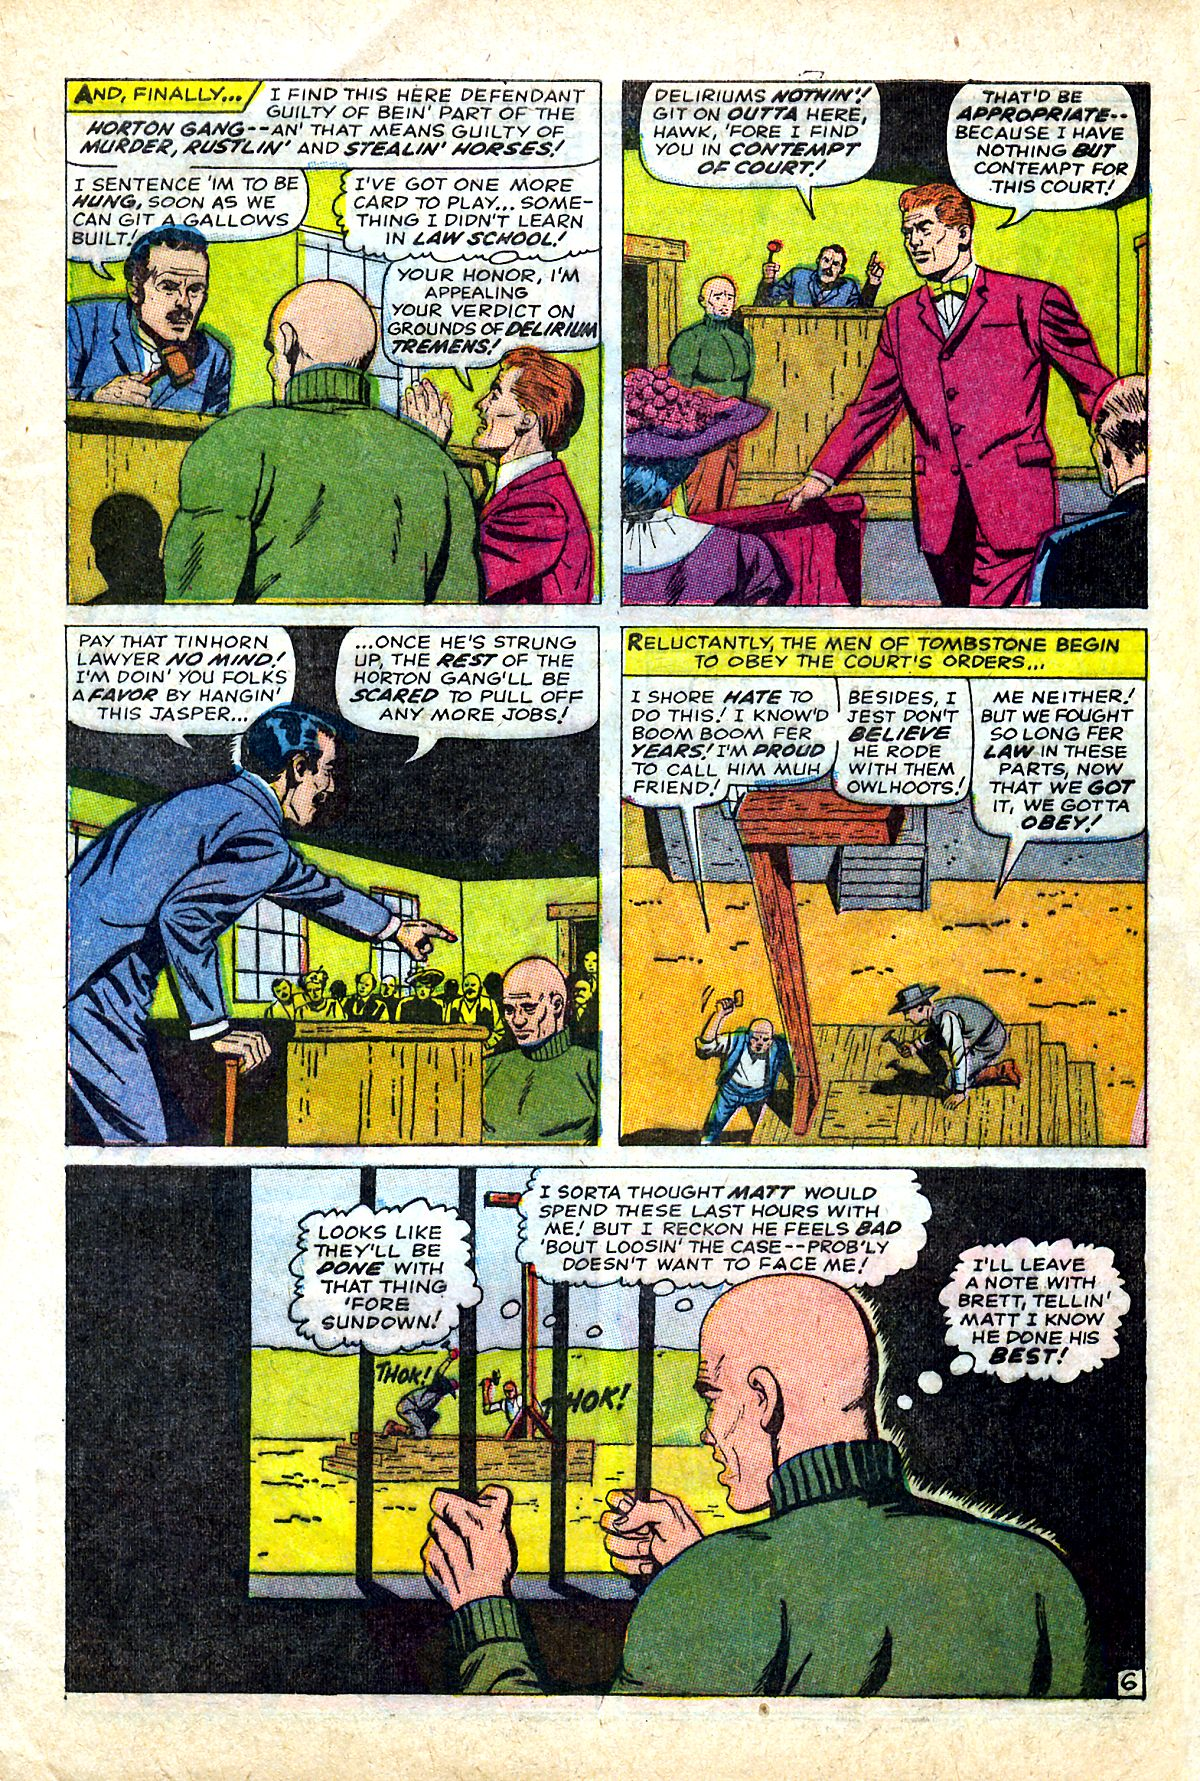 Read online Two-Gun Kid comic -  Issue #90 - 9